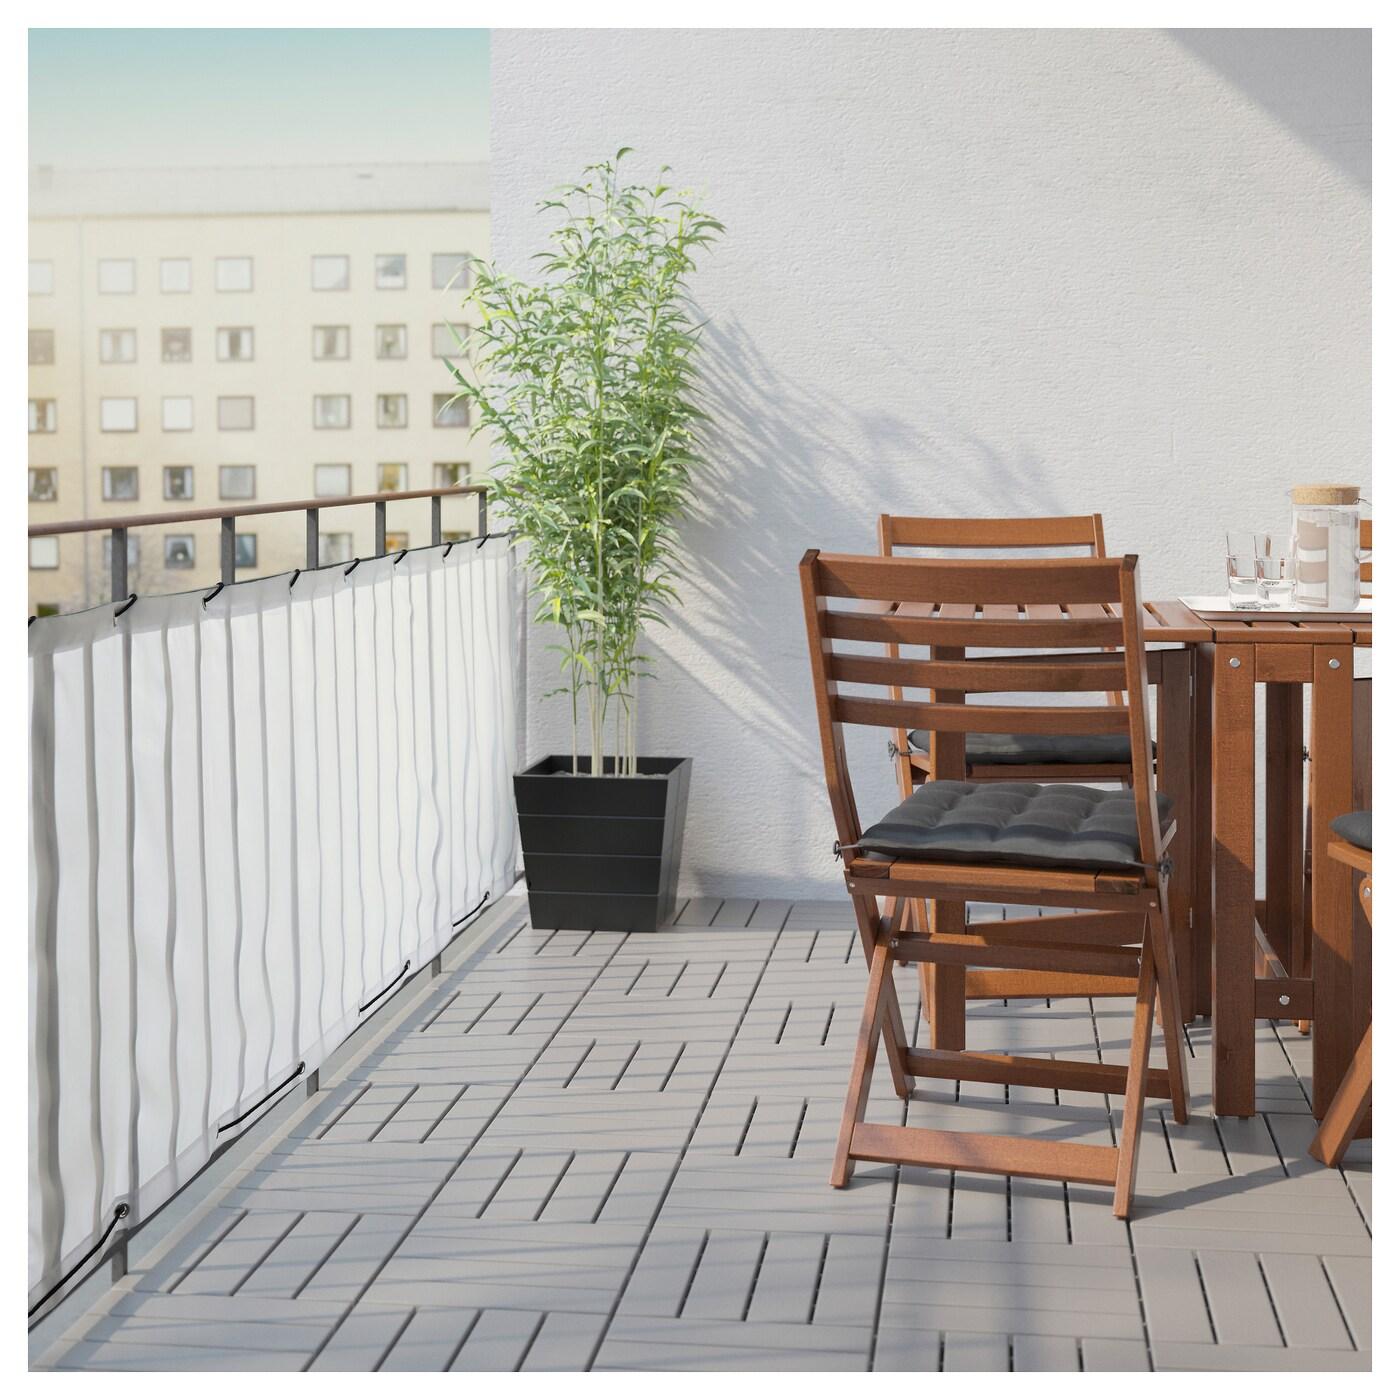 Full Size of Paravent Balkon Hornbach Sichtschutz Fur Den Garten Wohnzimmer Paravent Balkon Hornbach